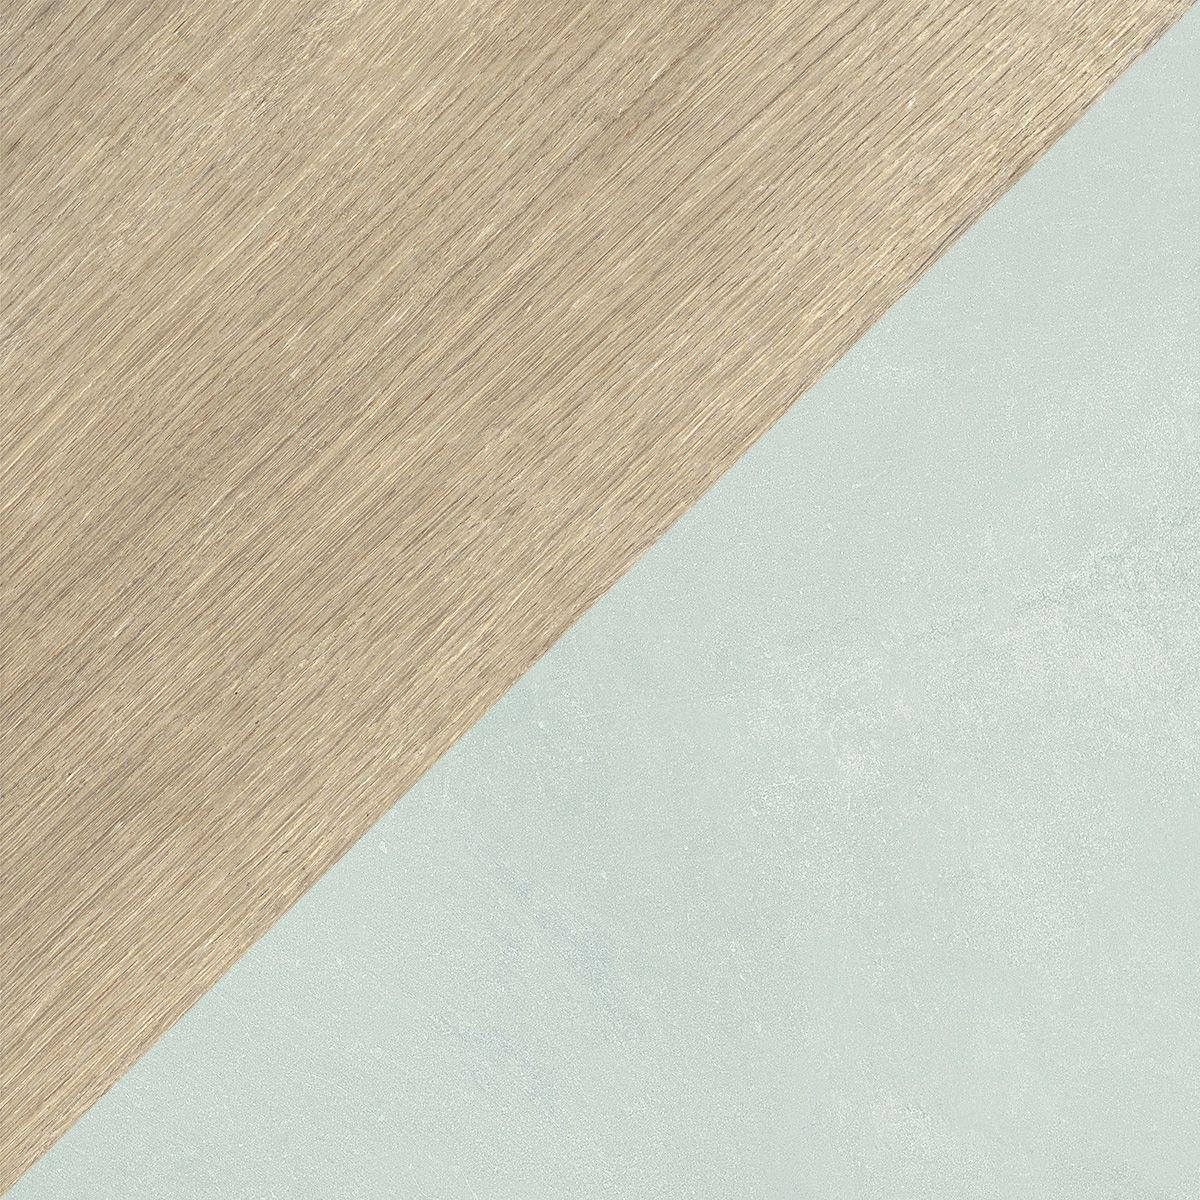 surface carrelage collection full gr s c rame surface home pinterest. Black Bedroom Furniture Sets. Home Design Ideas